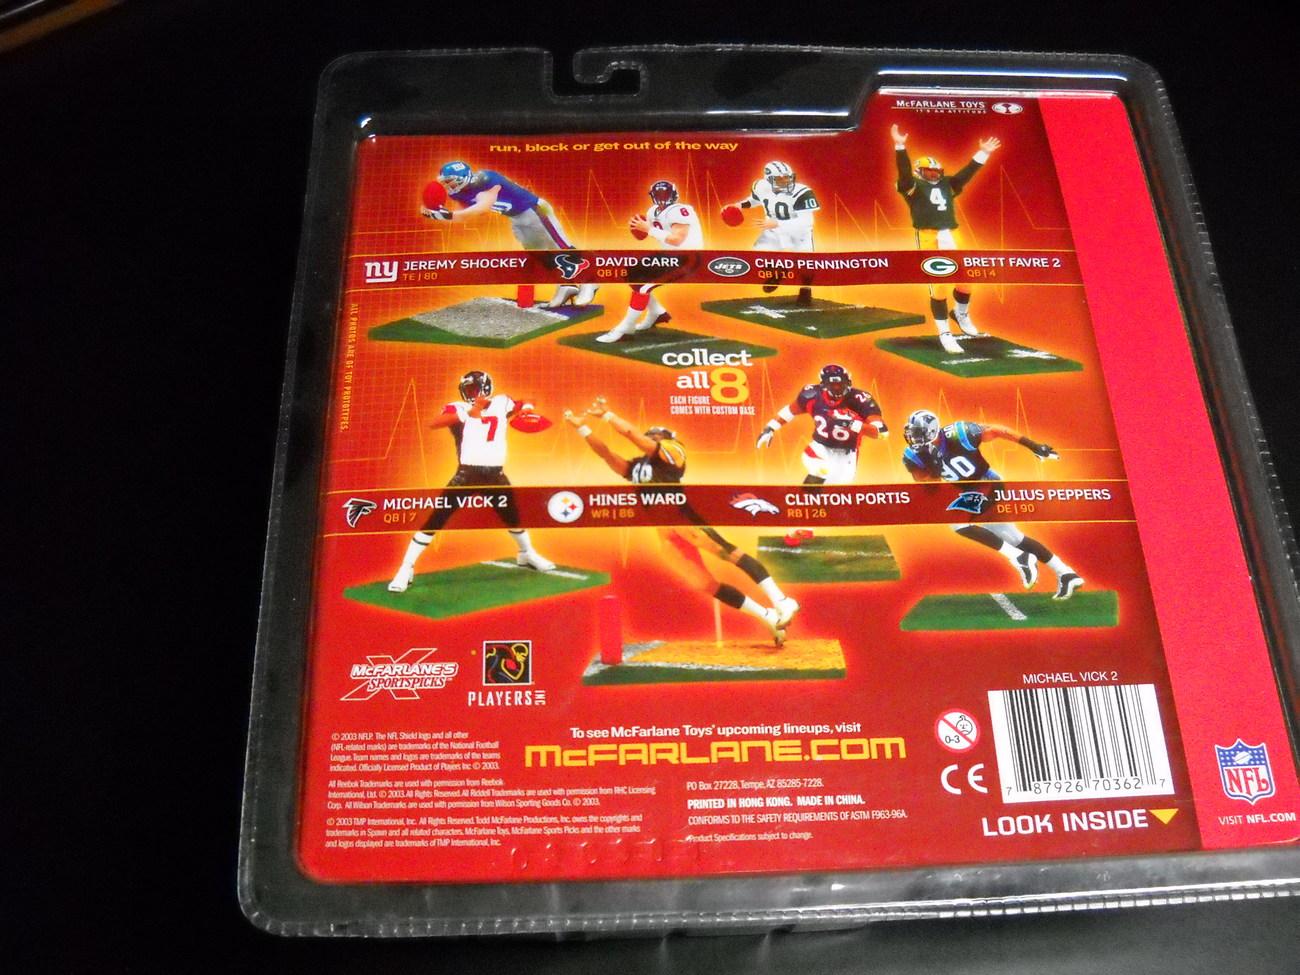 Football McFarlane Toys Quarterback Michael Vick Atlanta Falcons NFC South